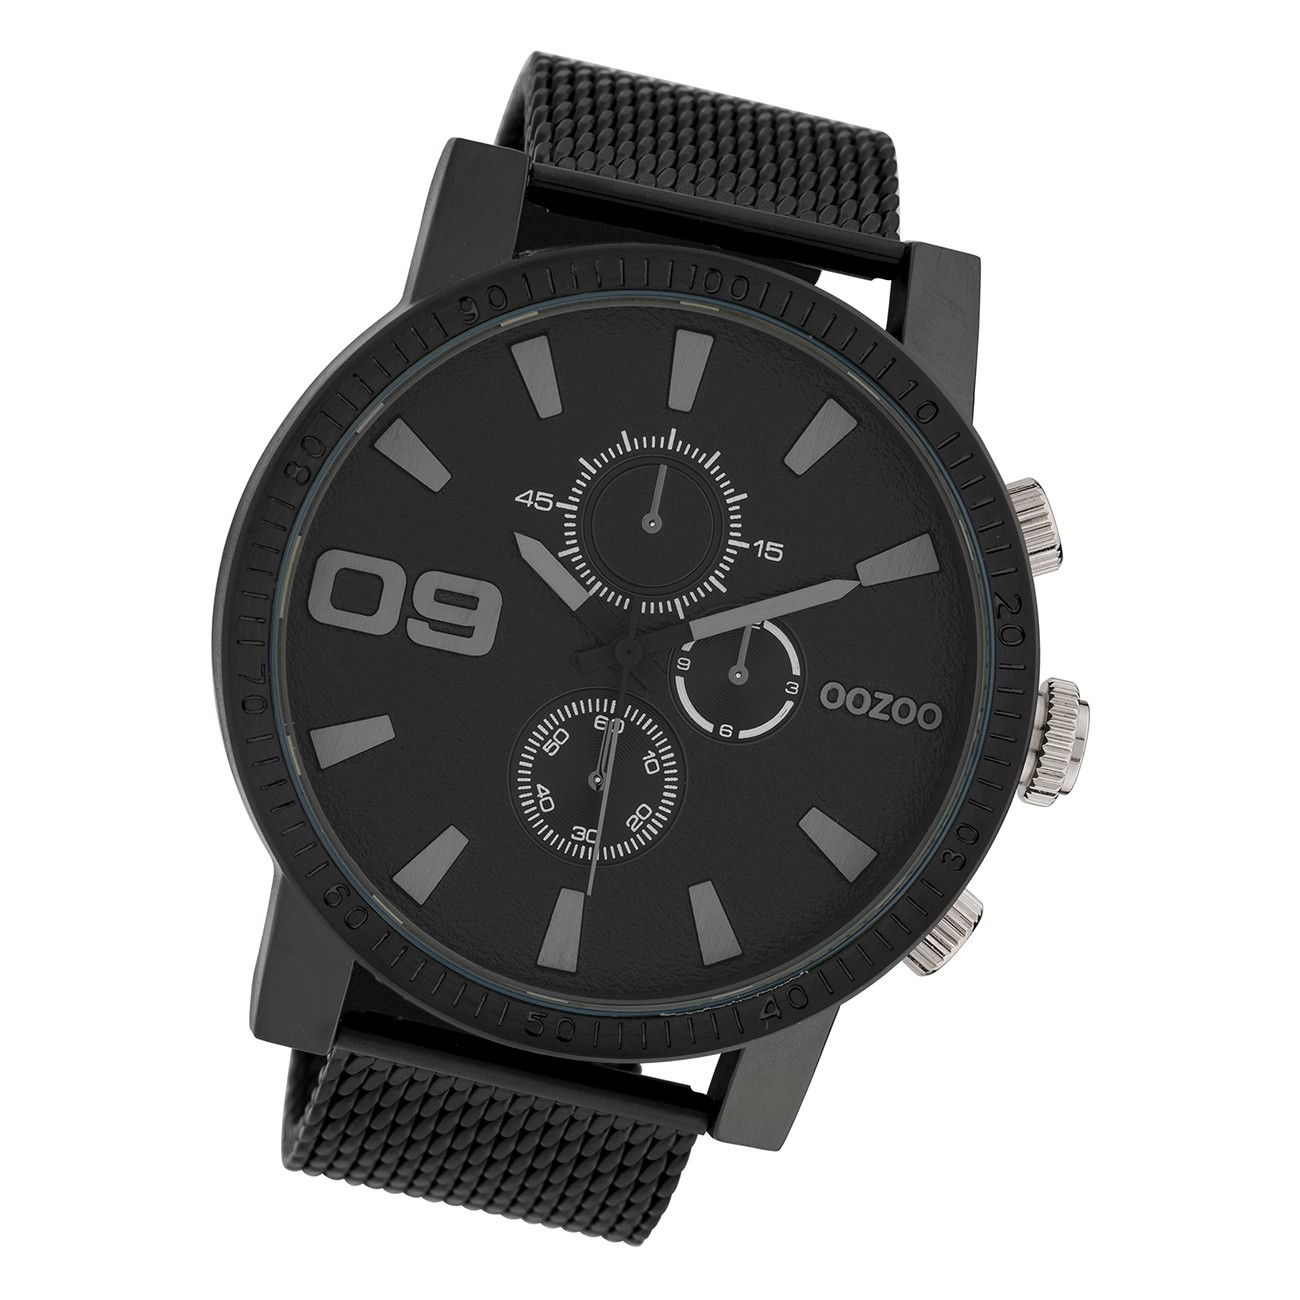 Oozoo Herren Armbanduhr Timepieces C10053 Analog Edelstahl schwarz UOC10053